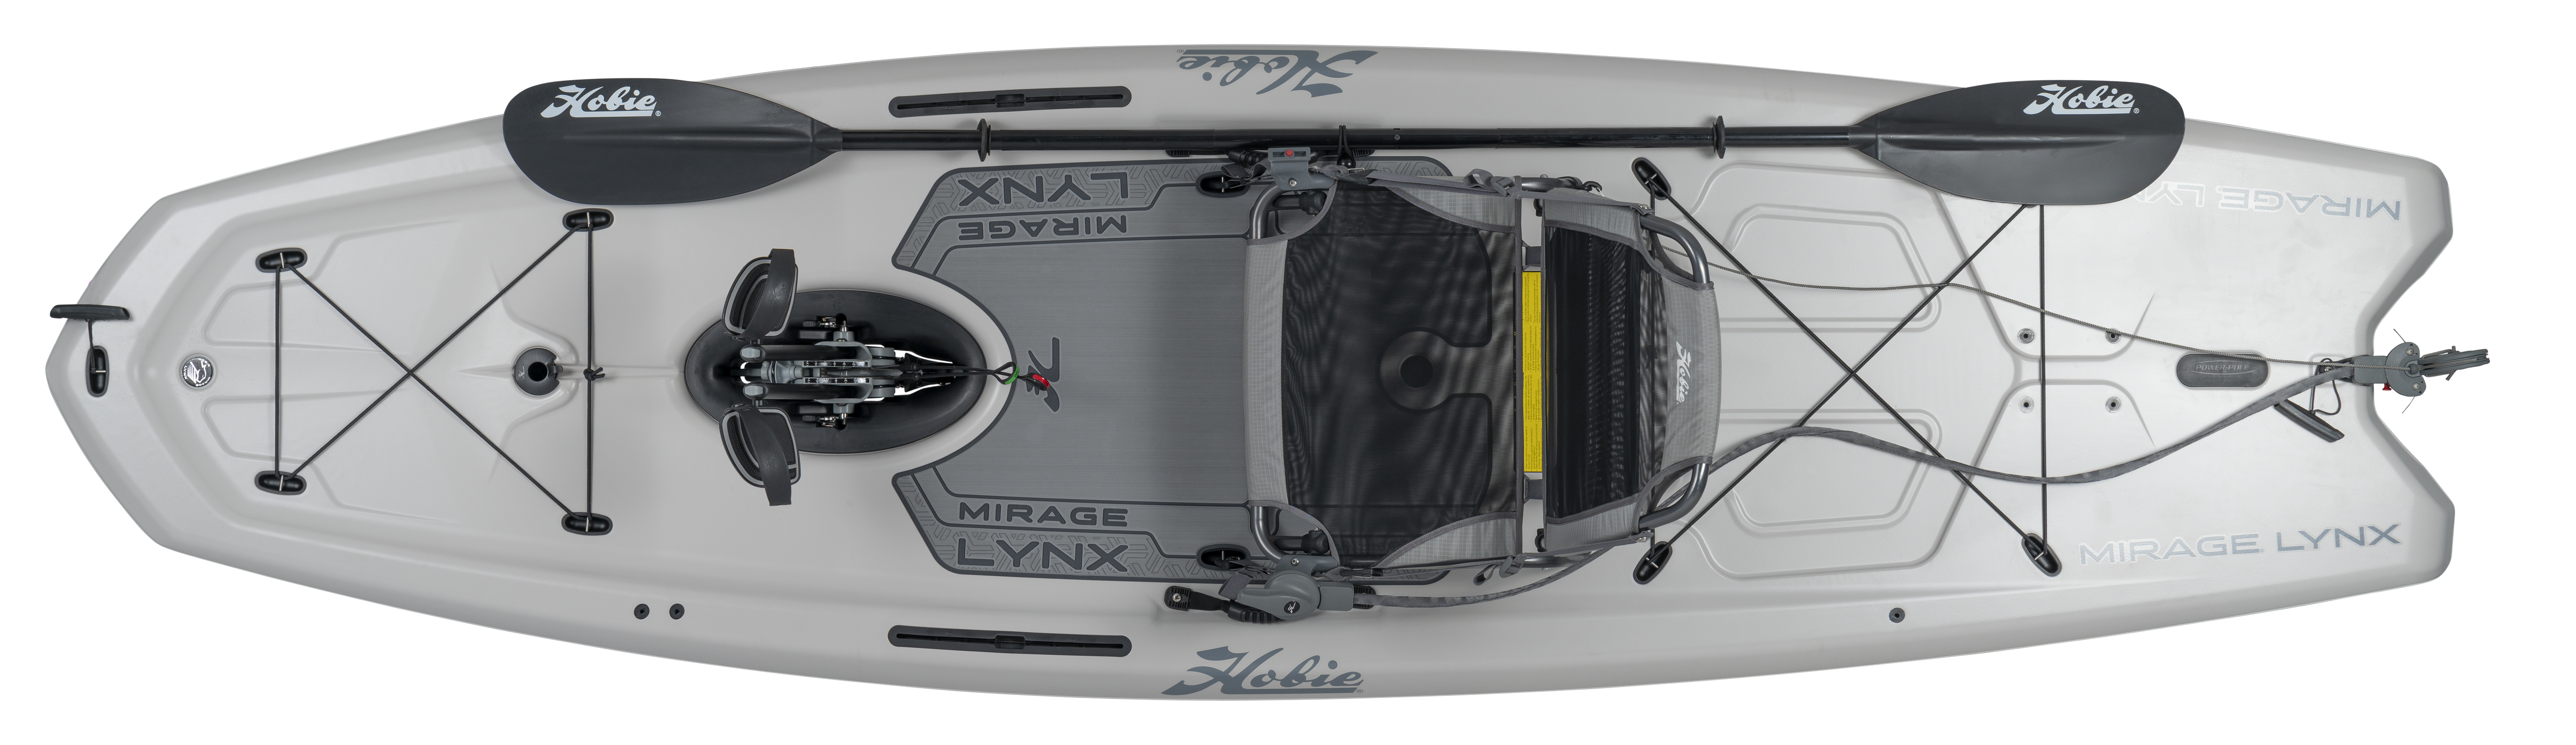 Mirage LYNX